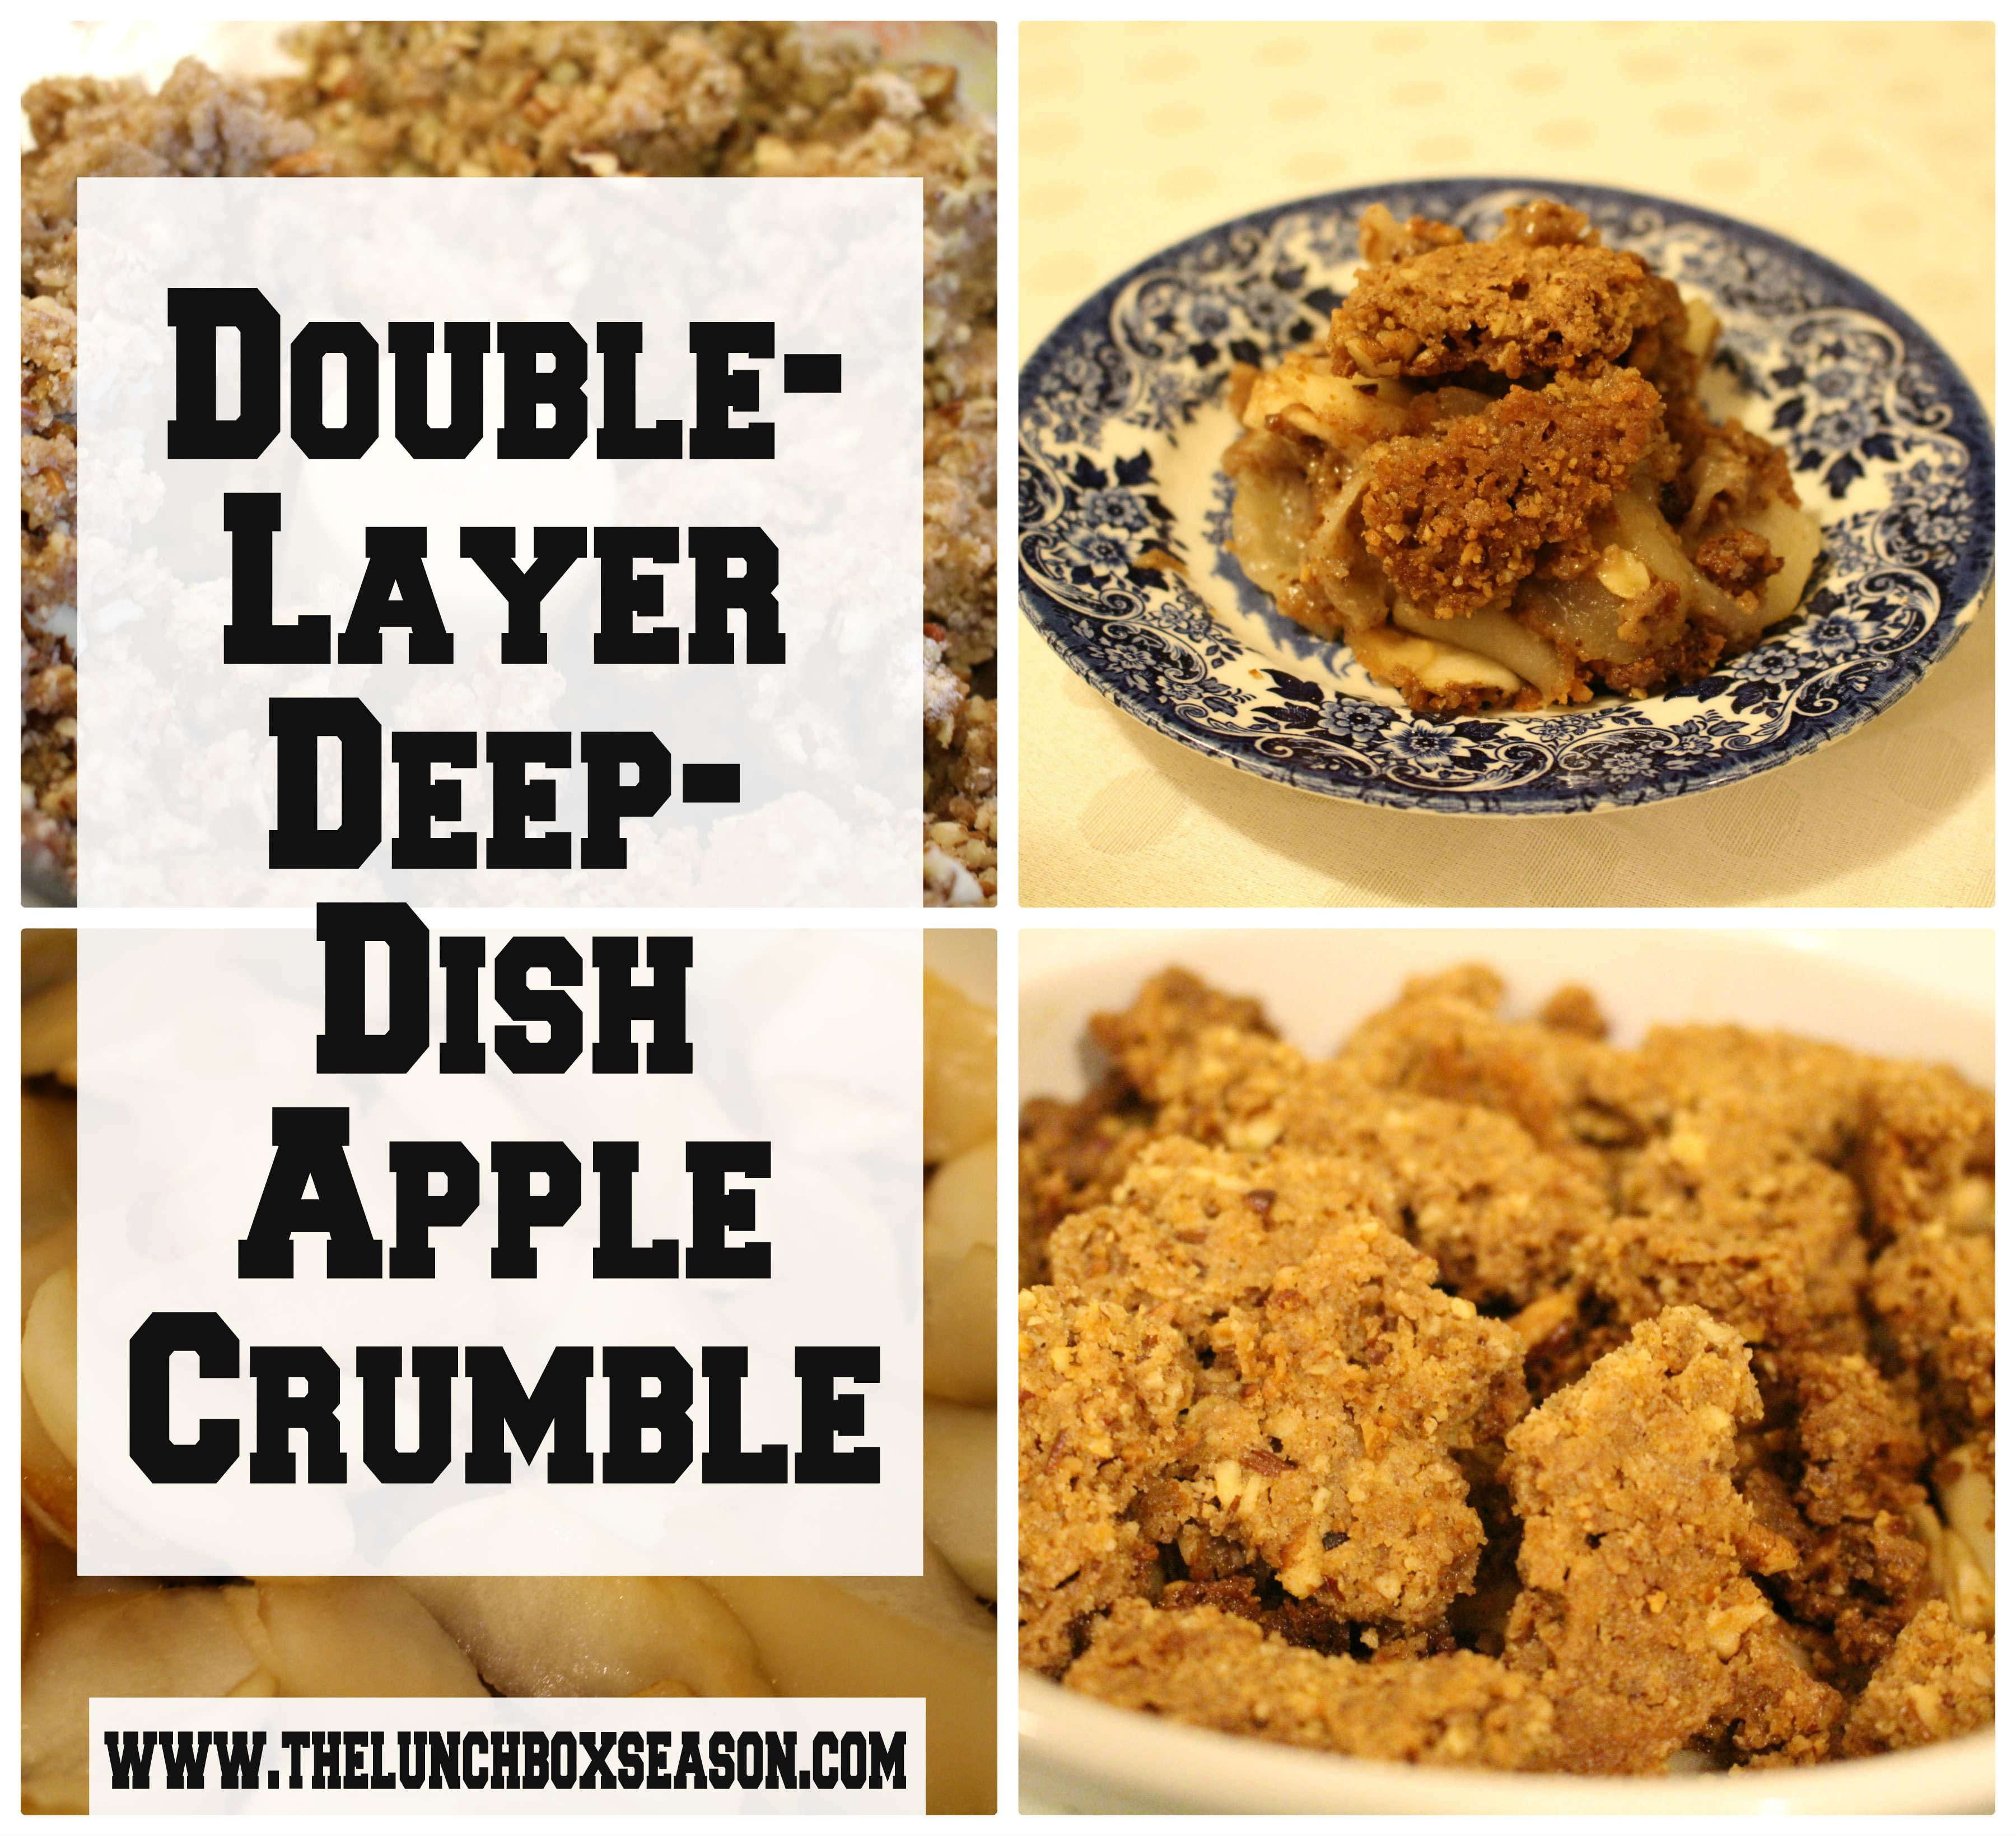 Double Layer Deep Dish Apple Crumble Recipe